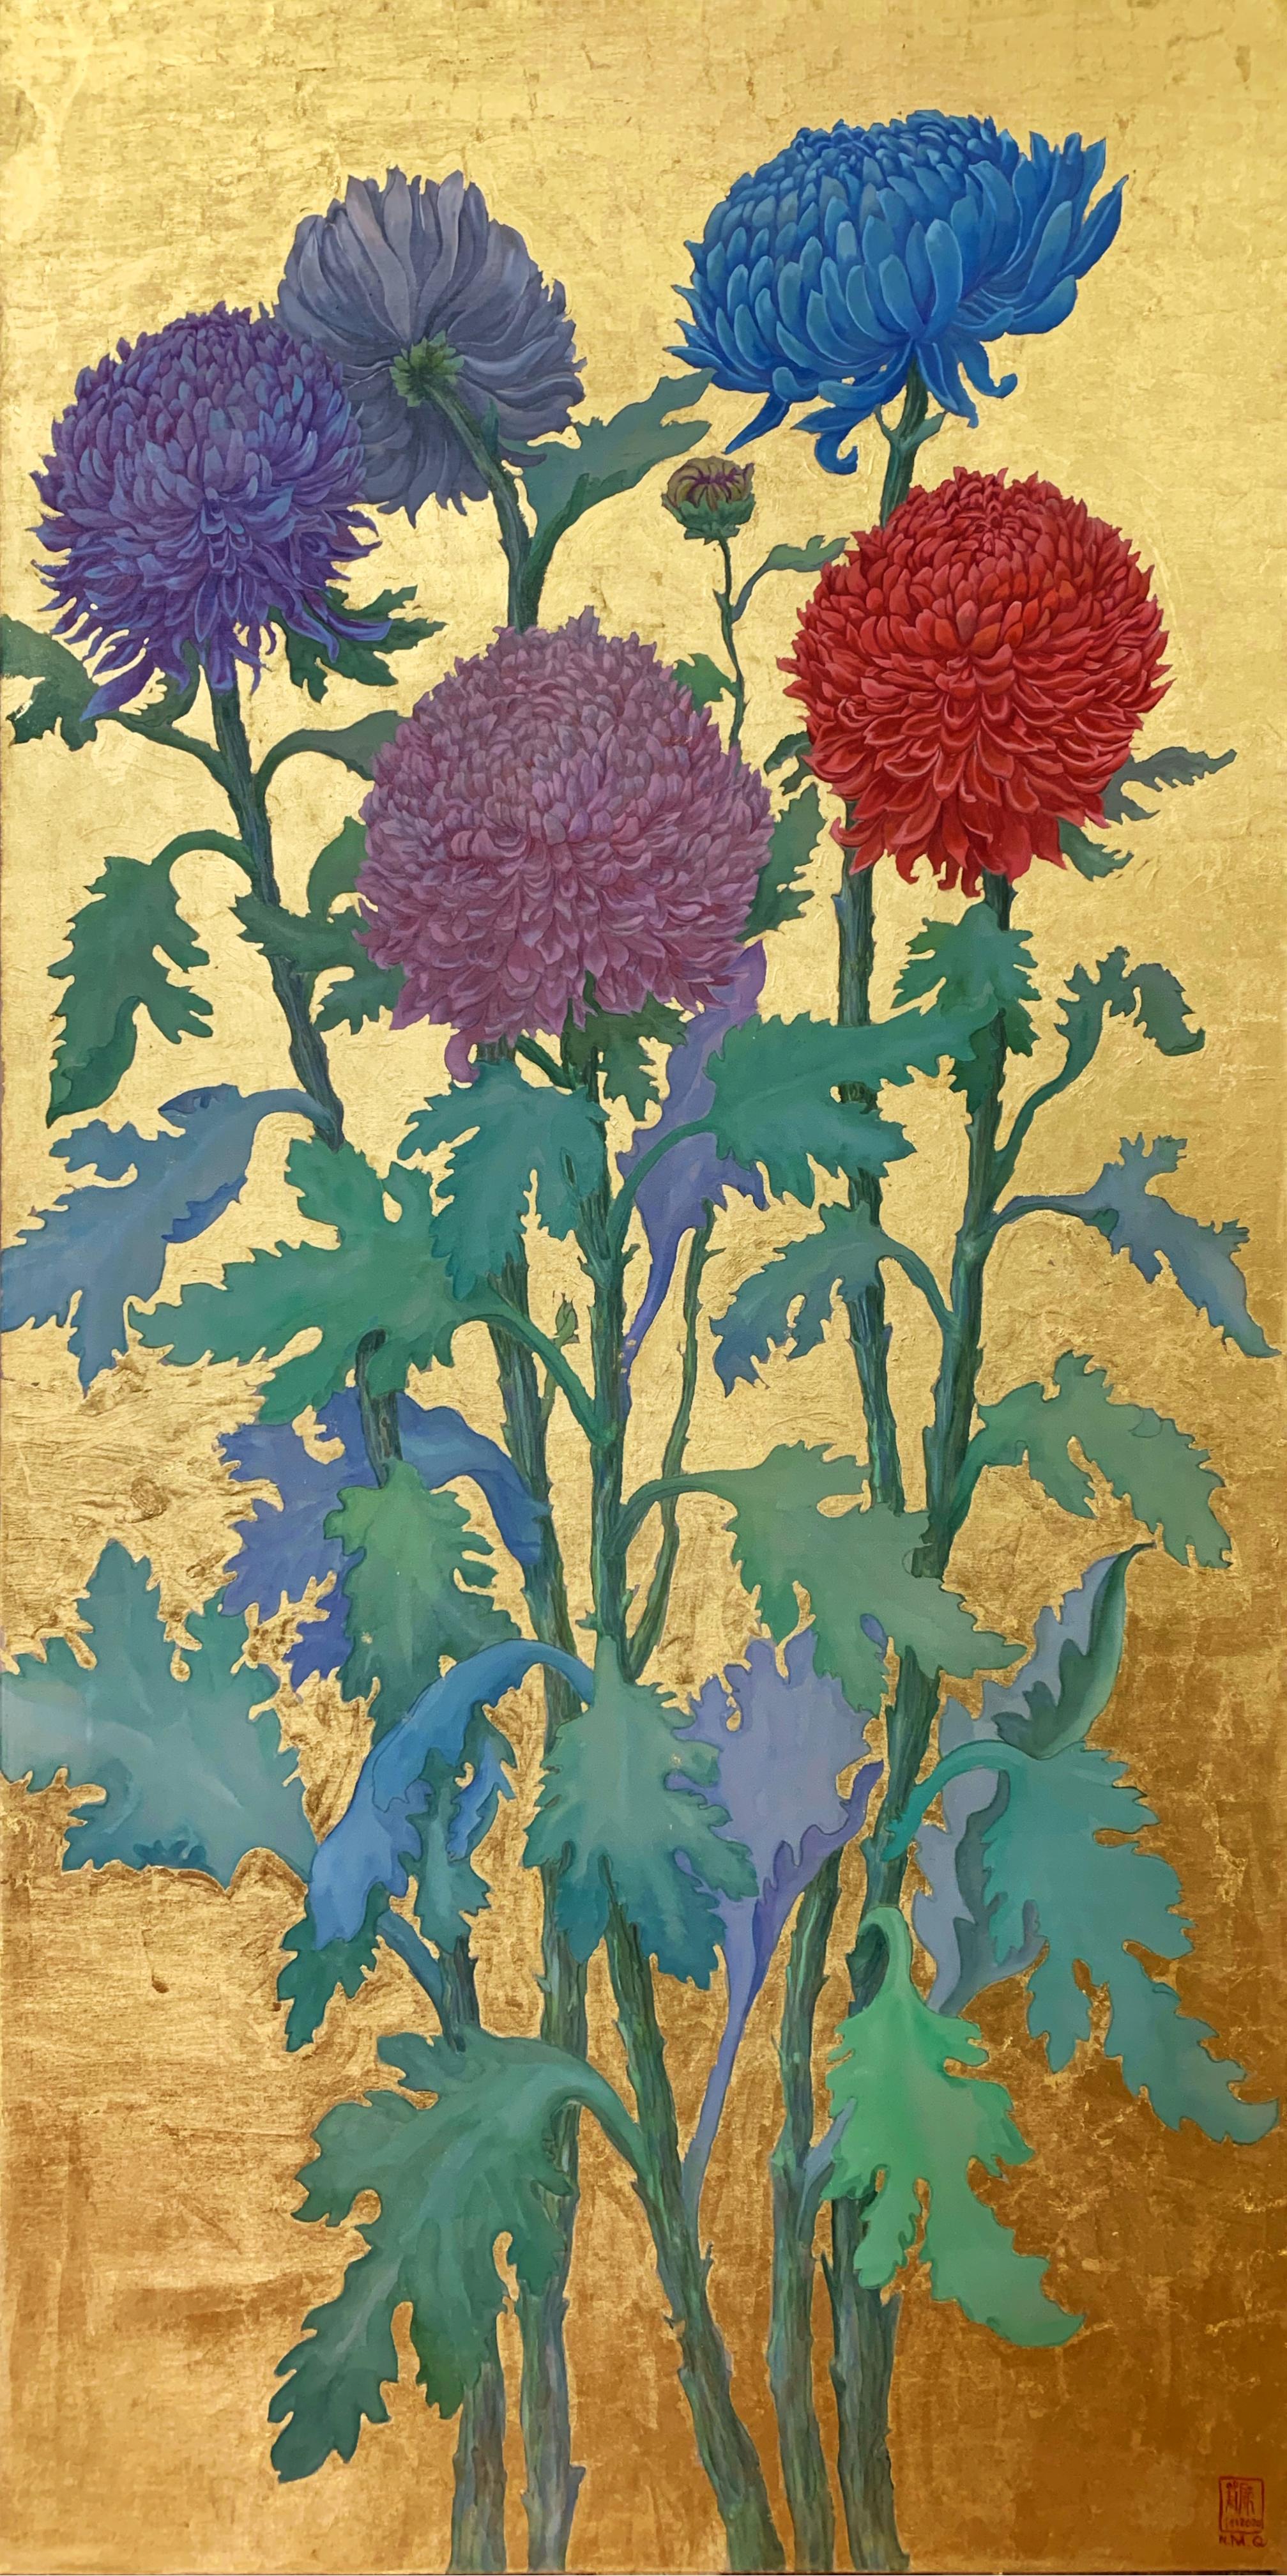 Dreamy Shape of a Floral | Hoa Gian Mộng Ảnh